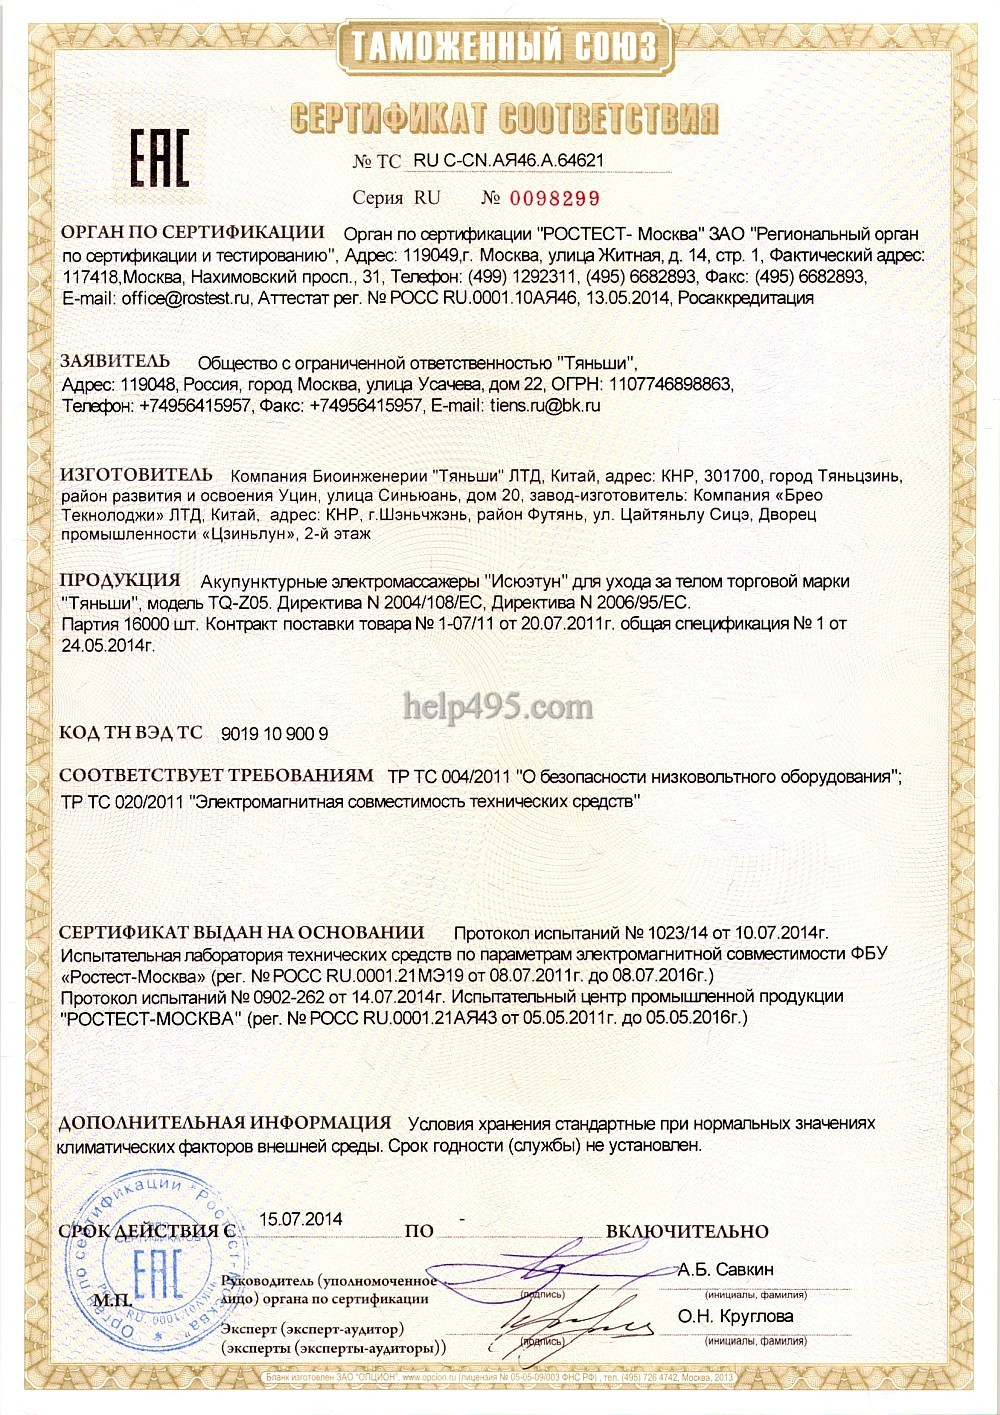 Сертификат соответствия прибора Тяньши: Акупунктурного электромассажёра Исюэтун